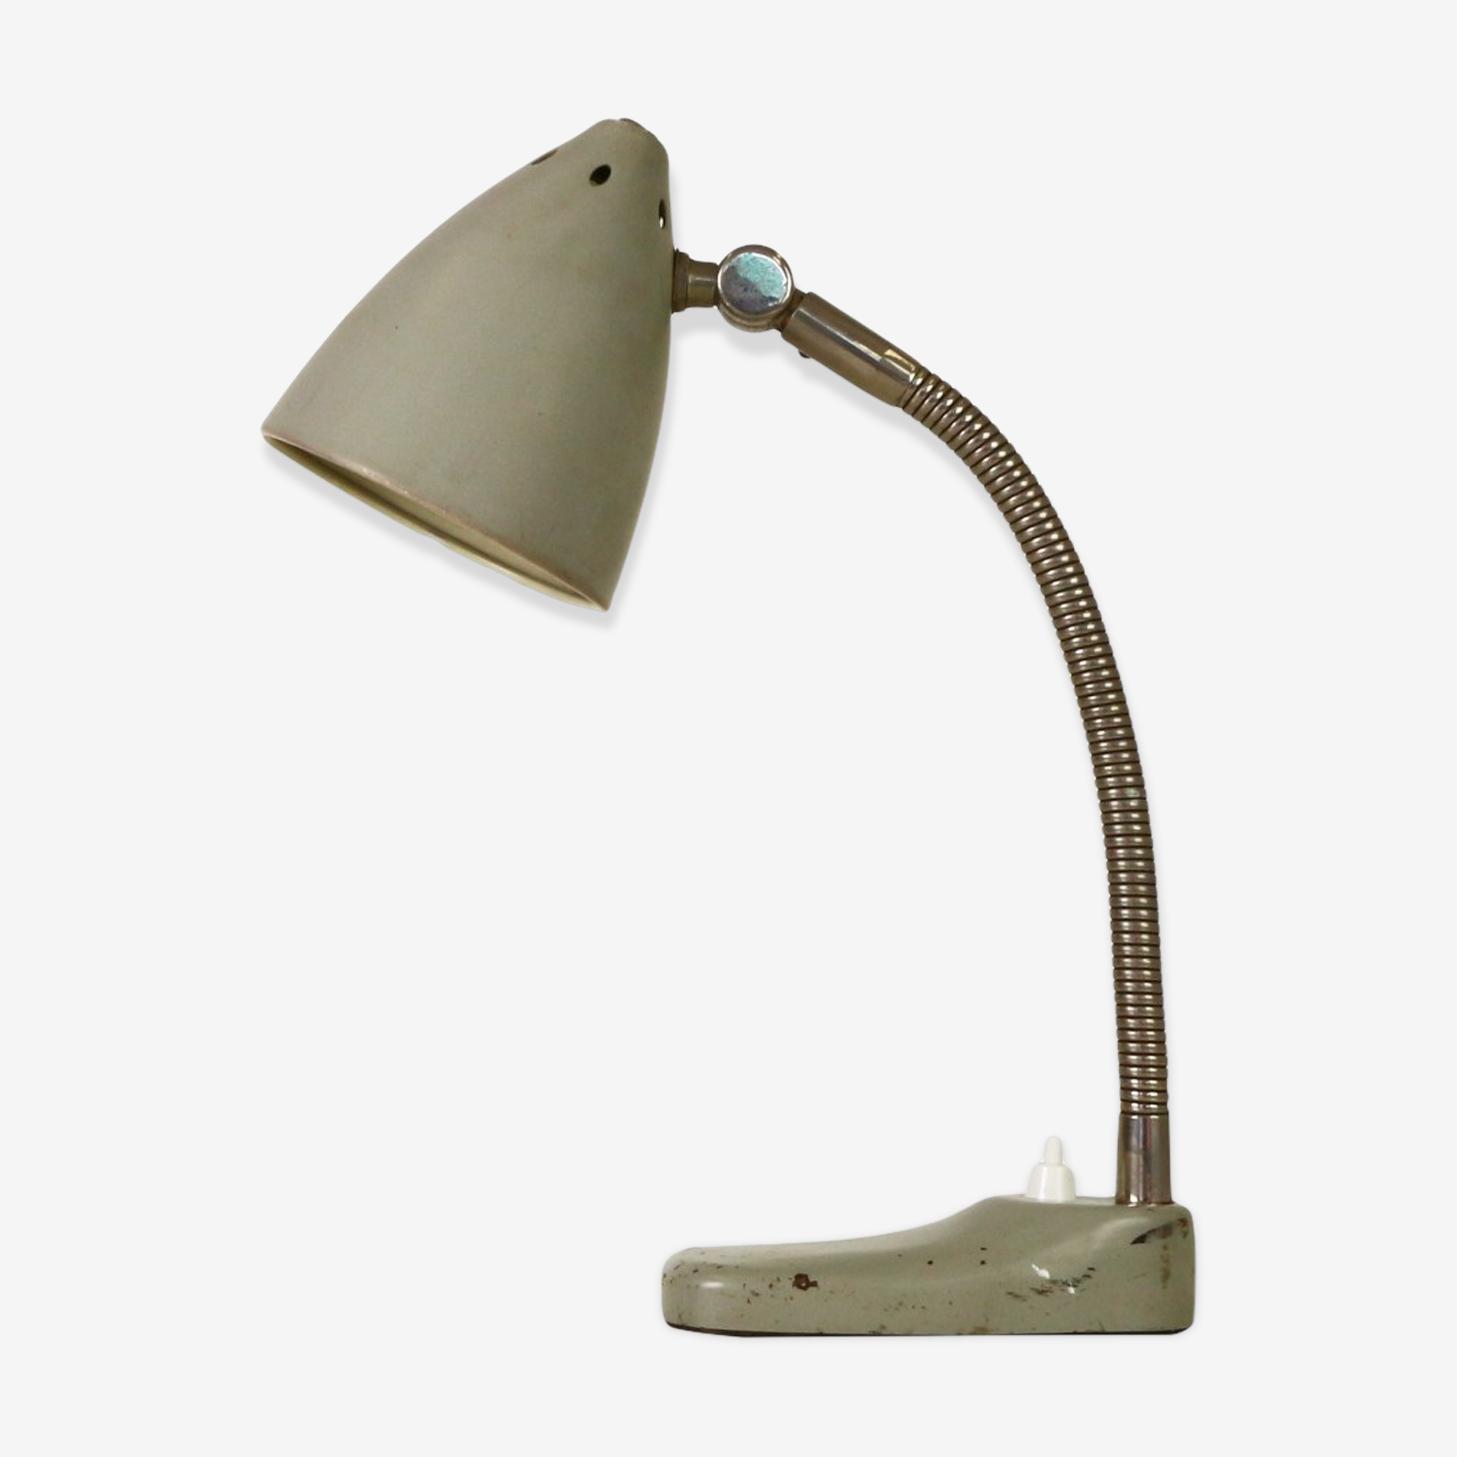 Lampe de bureau Hala Zeist de H. Busquet 1950